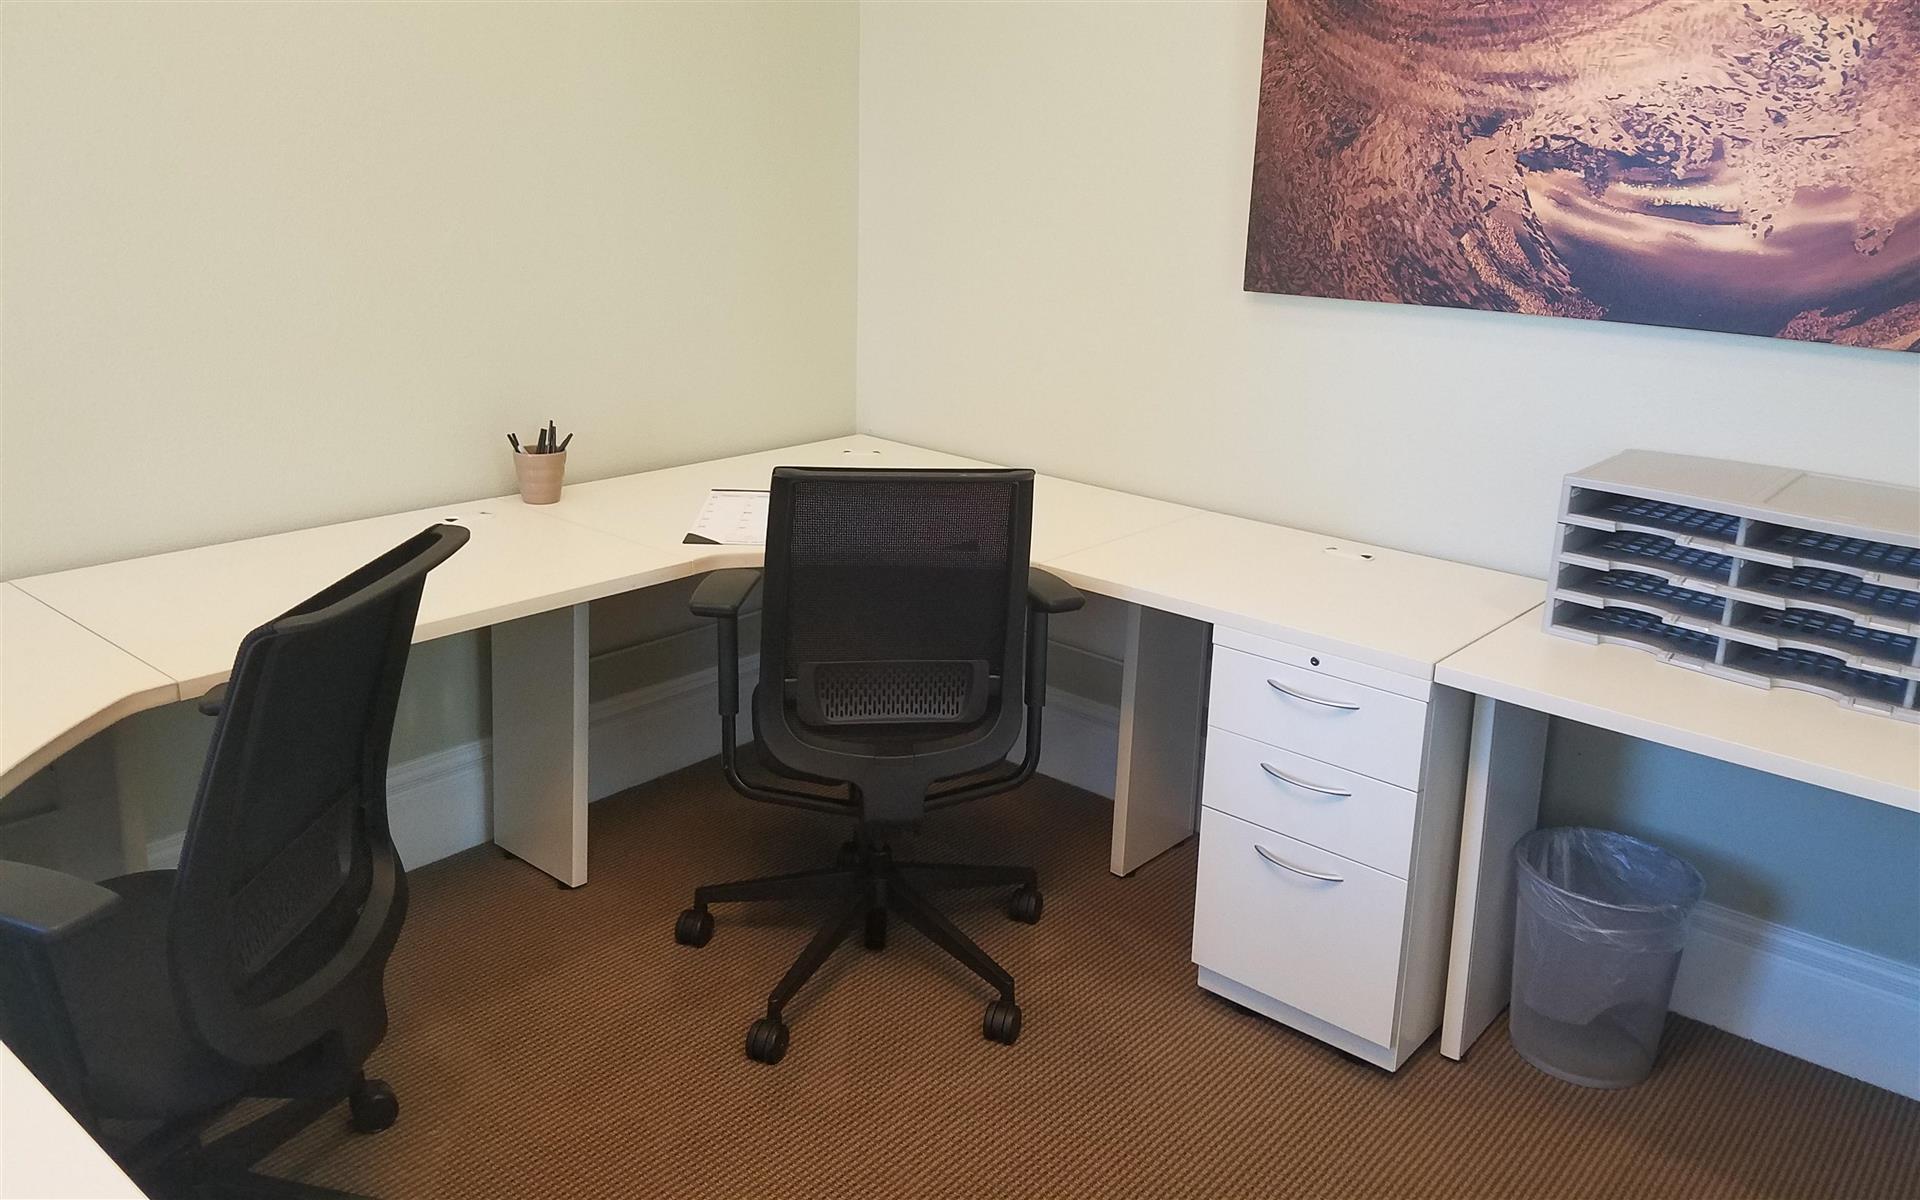 Victory Workspace Danville - Dedicated Desk B in the Green Room